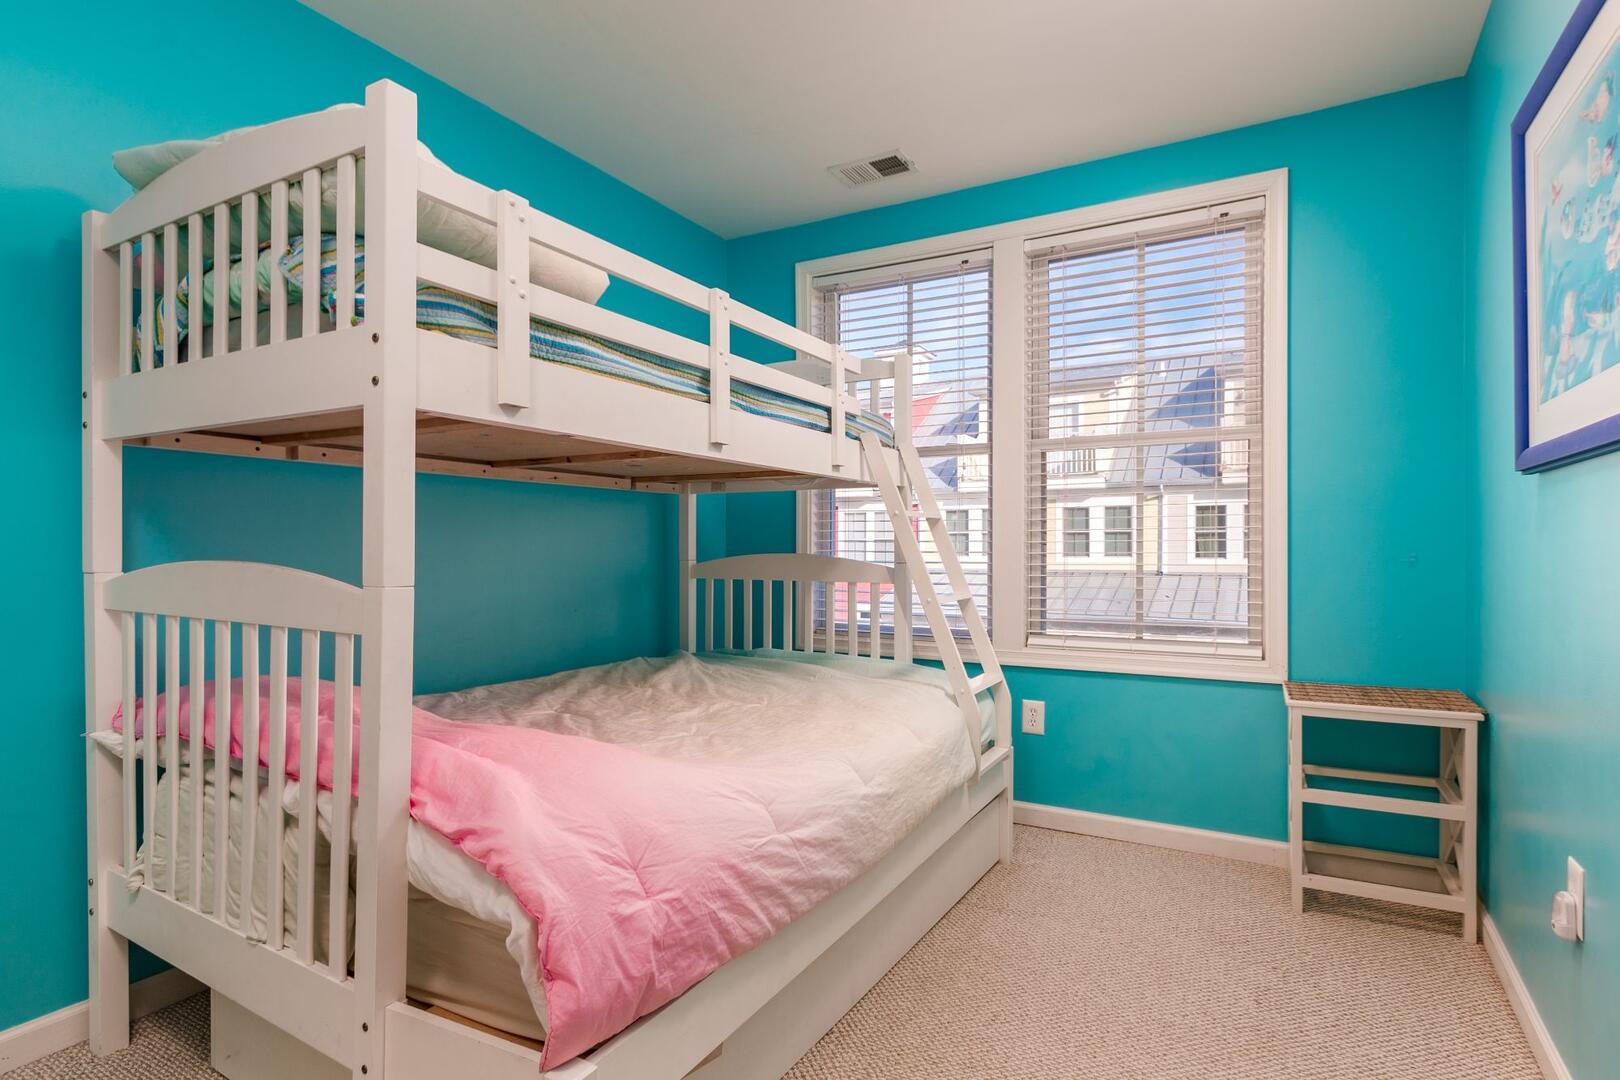 3rd Floor Bunk Bed Room - Sunset Island 34 Island Edge Dr.